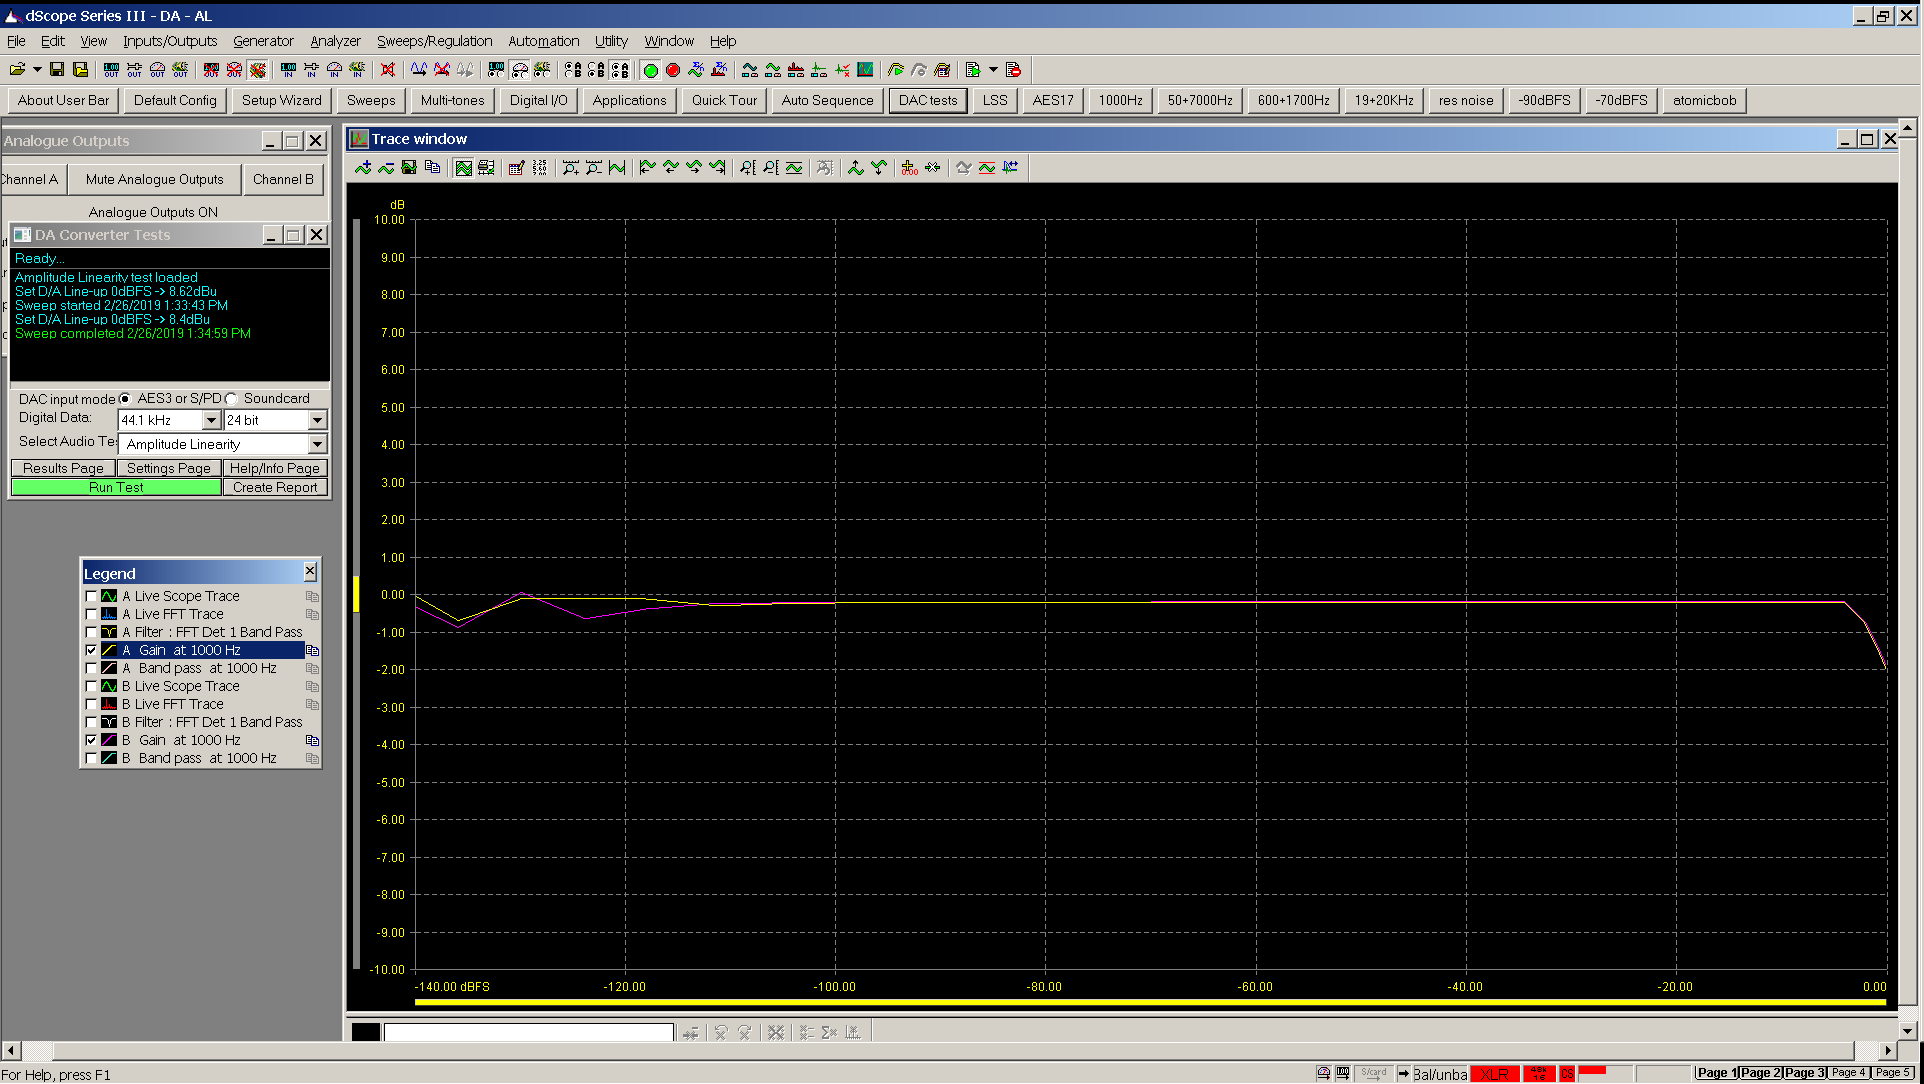 20190221 P20 1 KHz gain linearity 30R.PNG